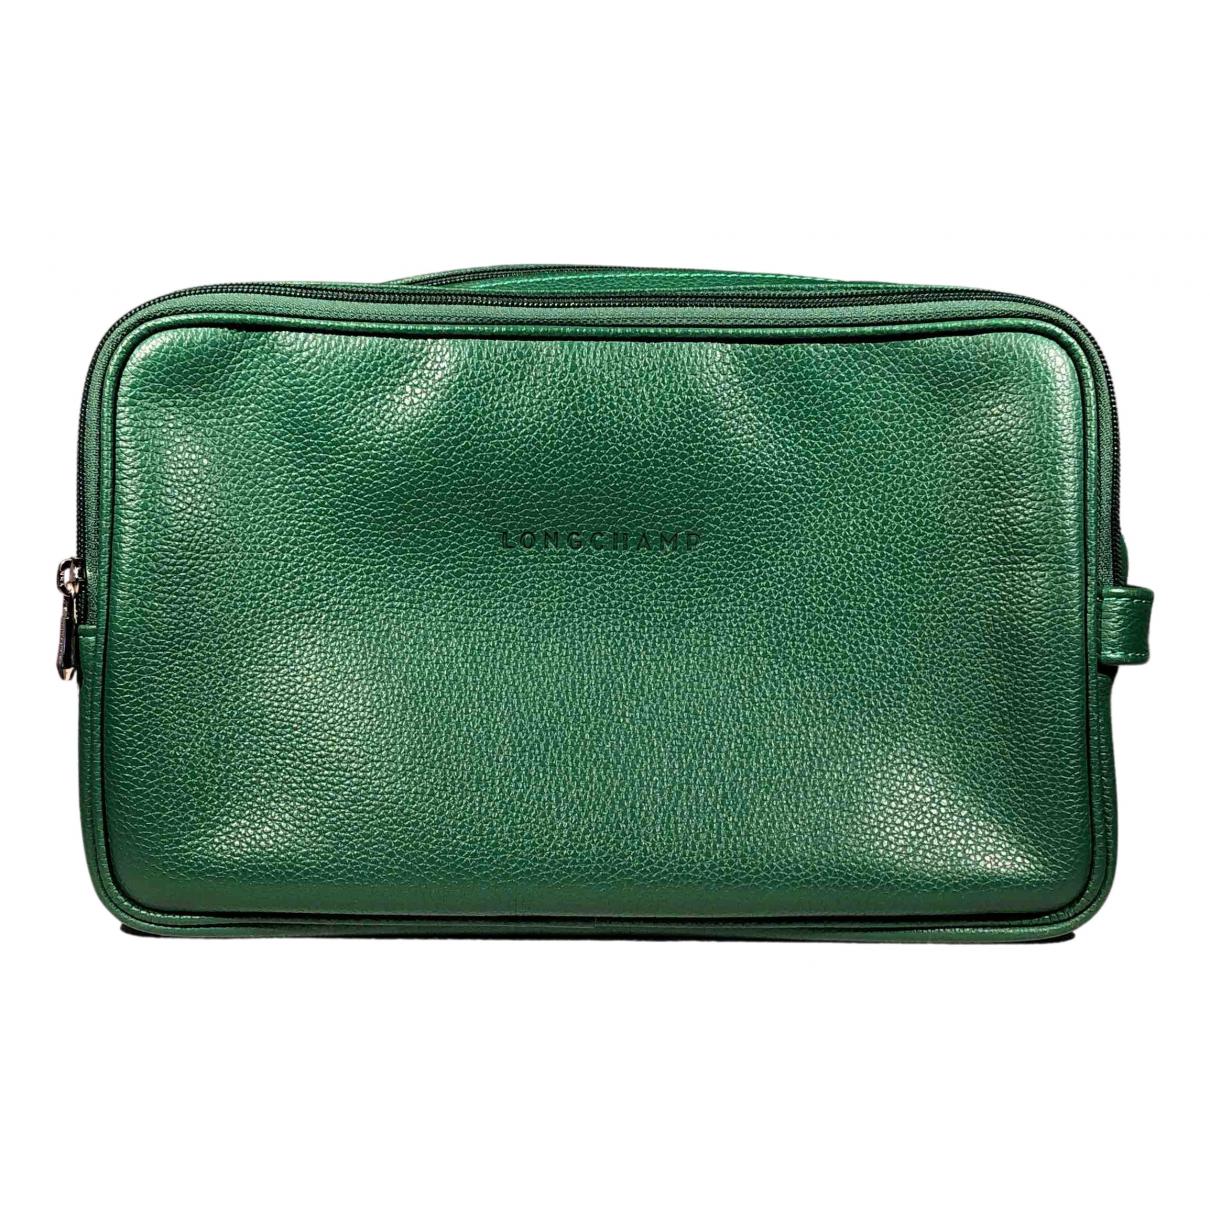 Longchamp \N Kleinlederwaren in  Gruen Leder